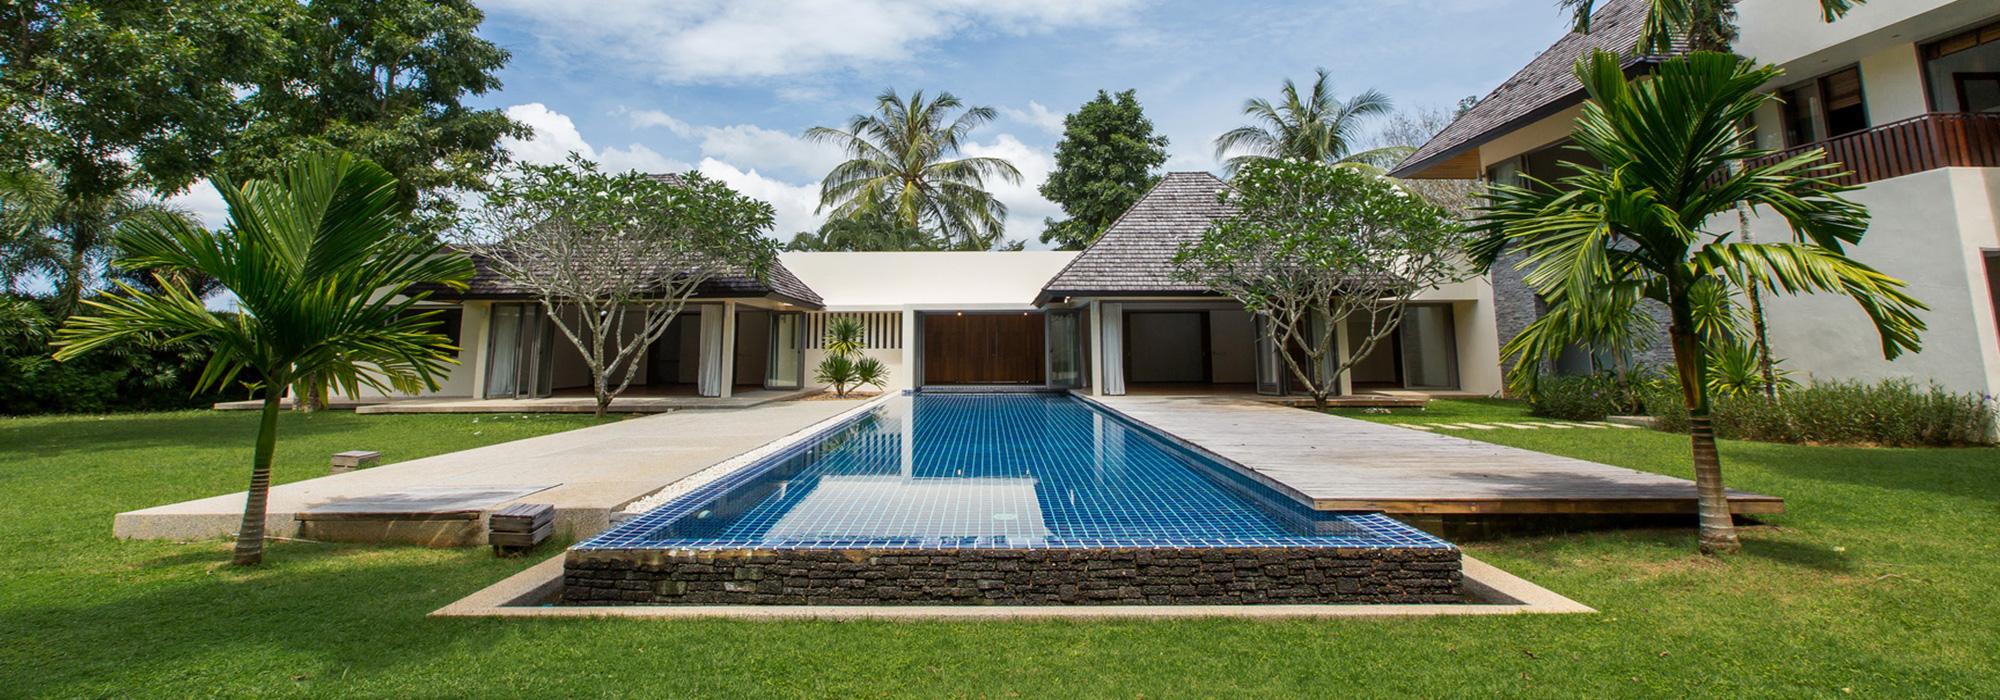 Pool Villa for Rent in Phuket. 5 bedrooms